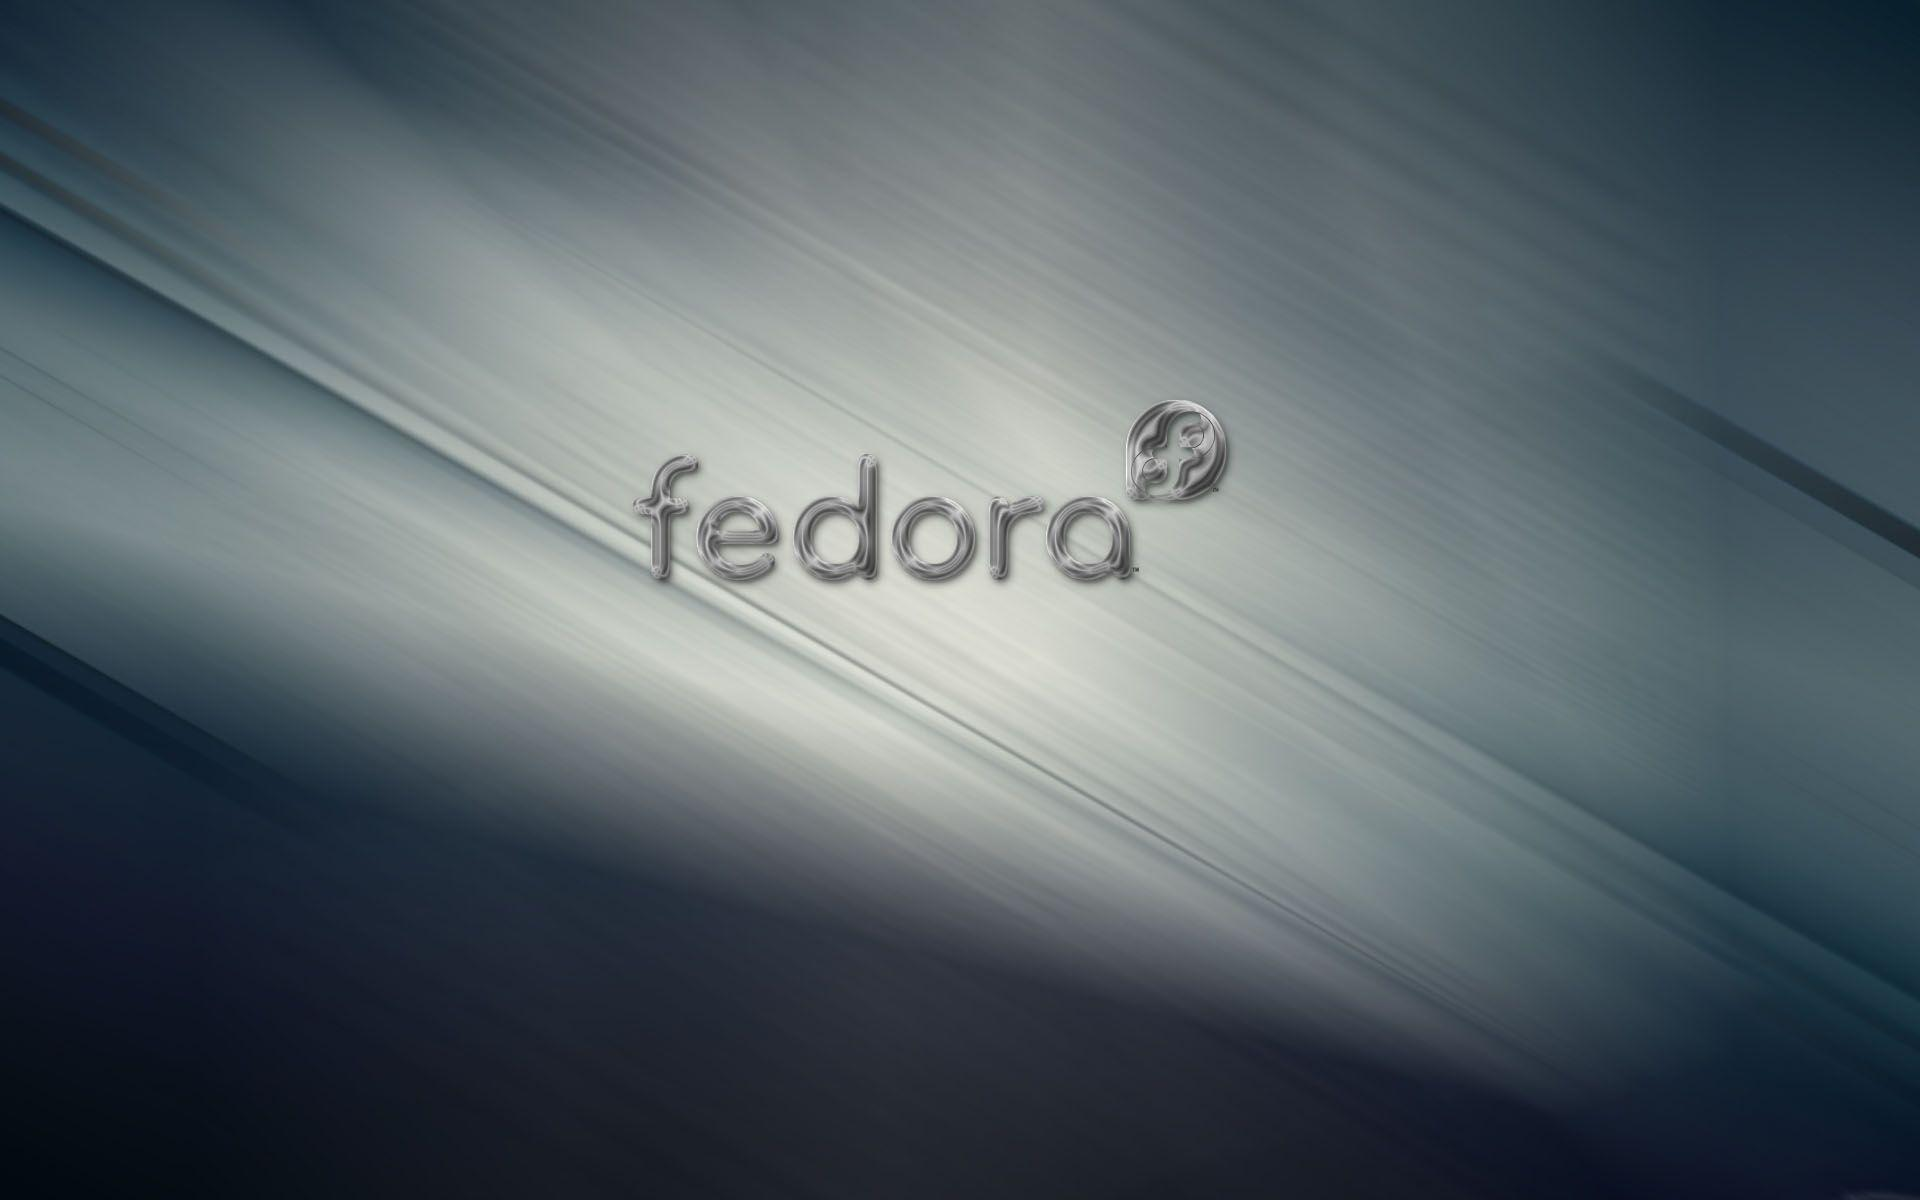 linux fedora wallpaper - photo #12